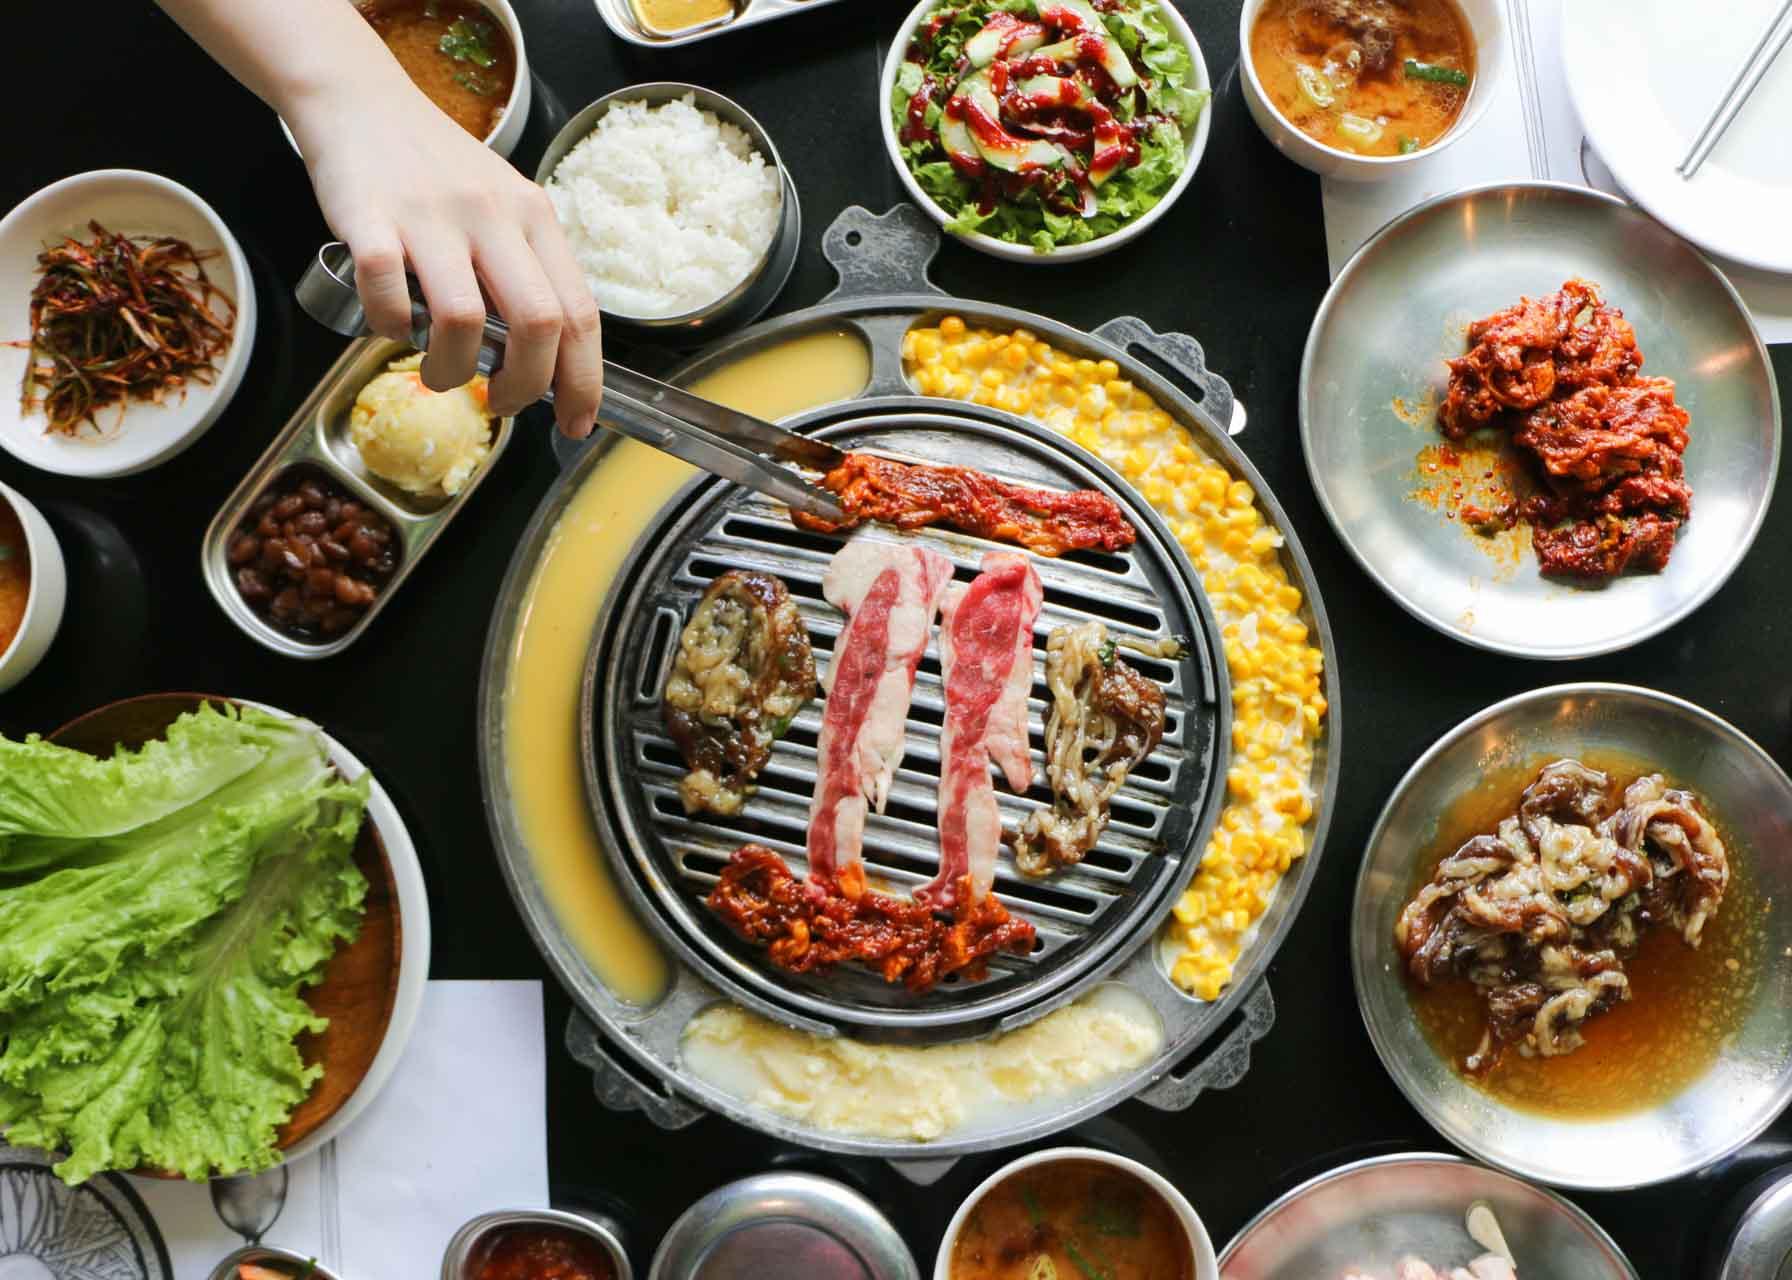 The Best Korean BBQ Restaurants You Can Find in Quezon City